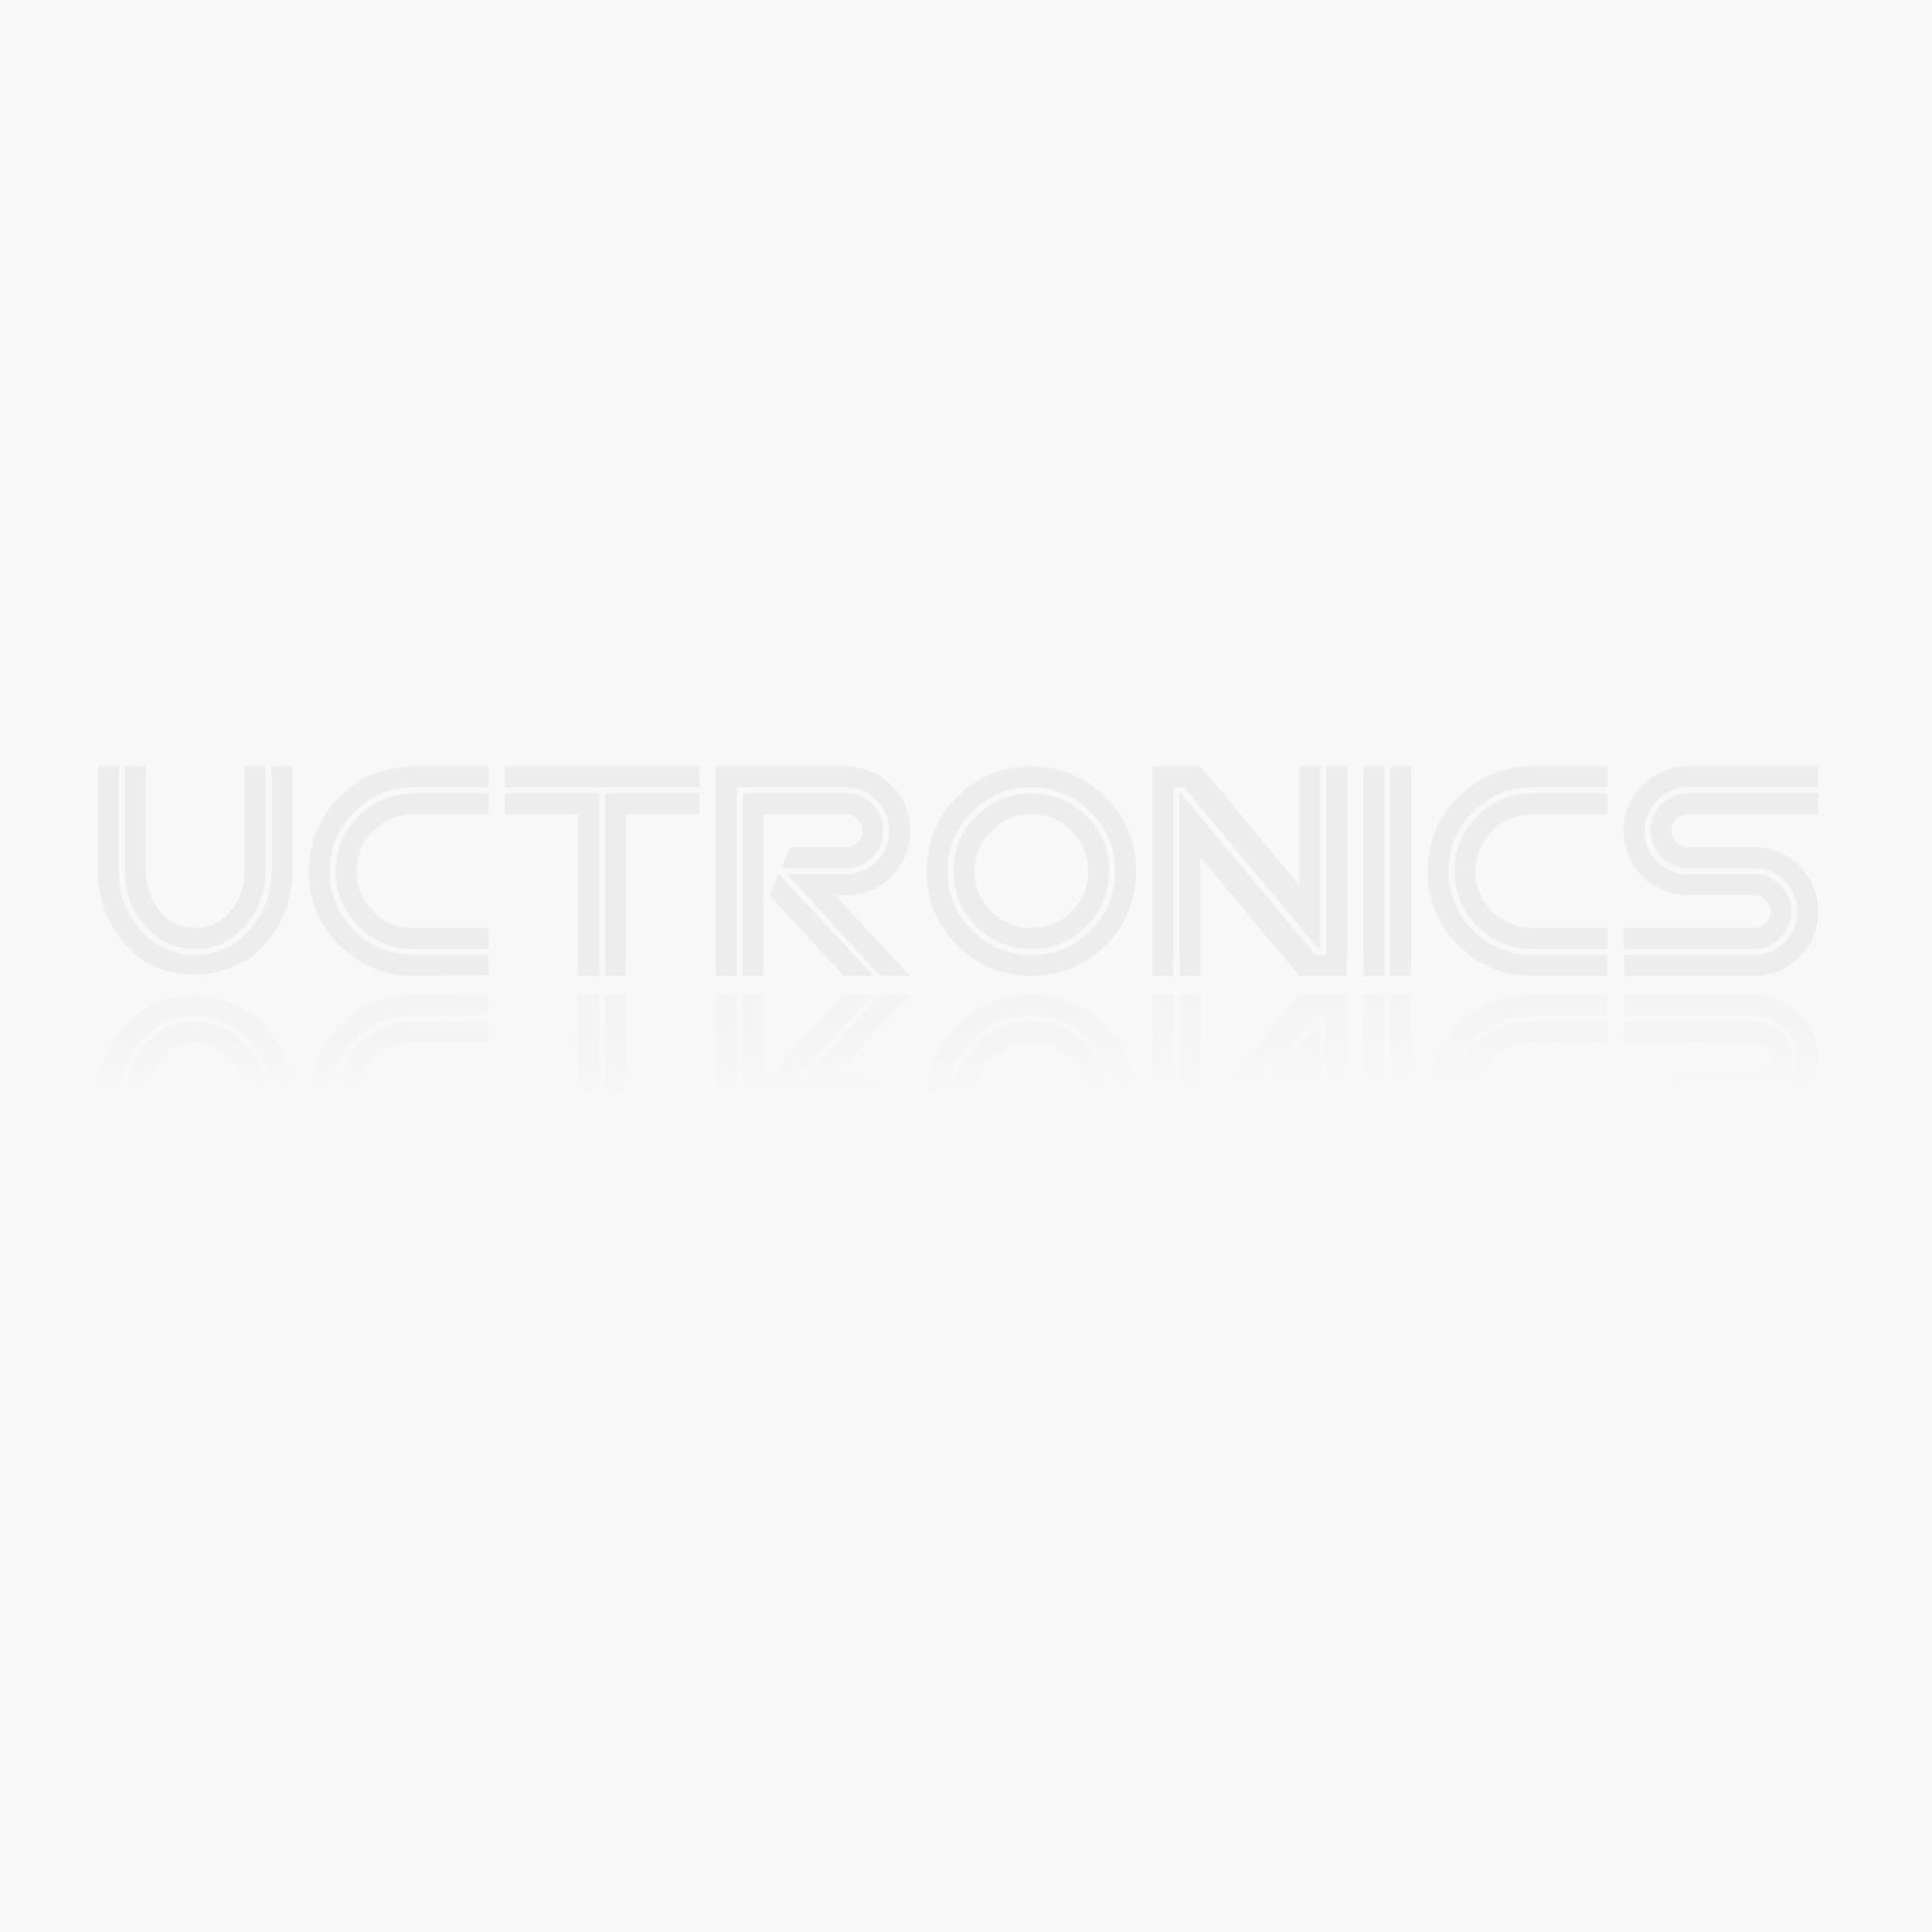 433MHz Wireless Transmitter Module 100-200m DC 9-12V EV1527 for Arduino